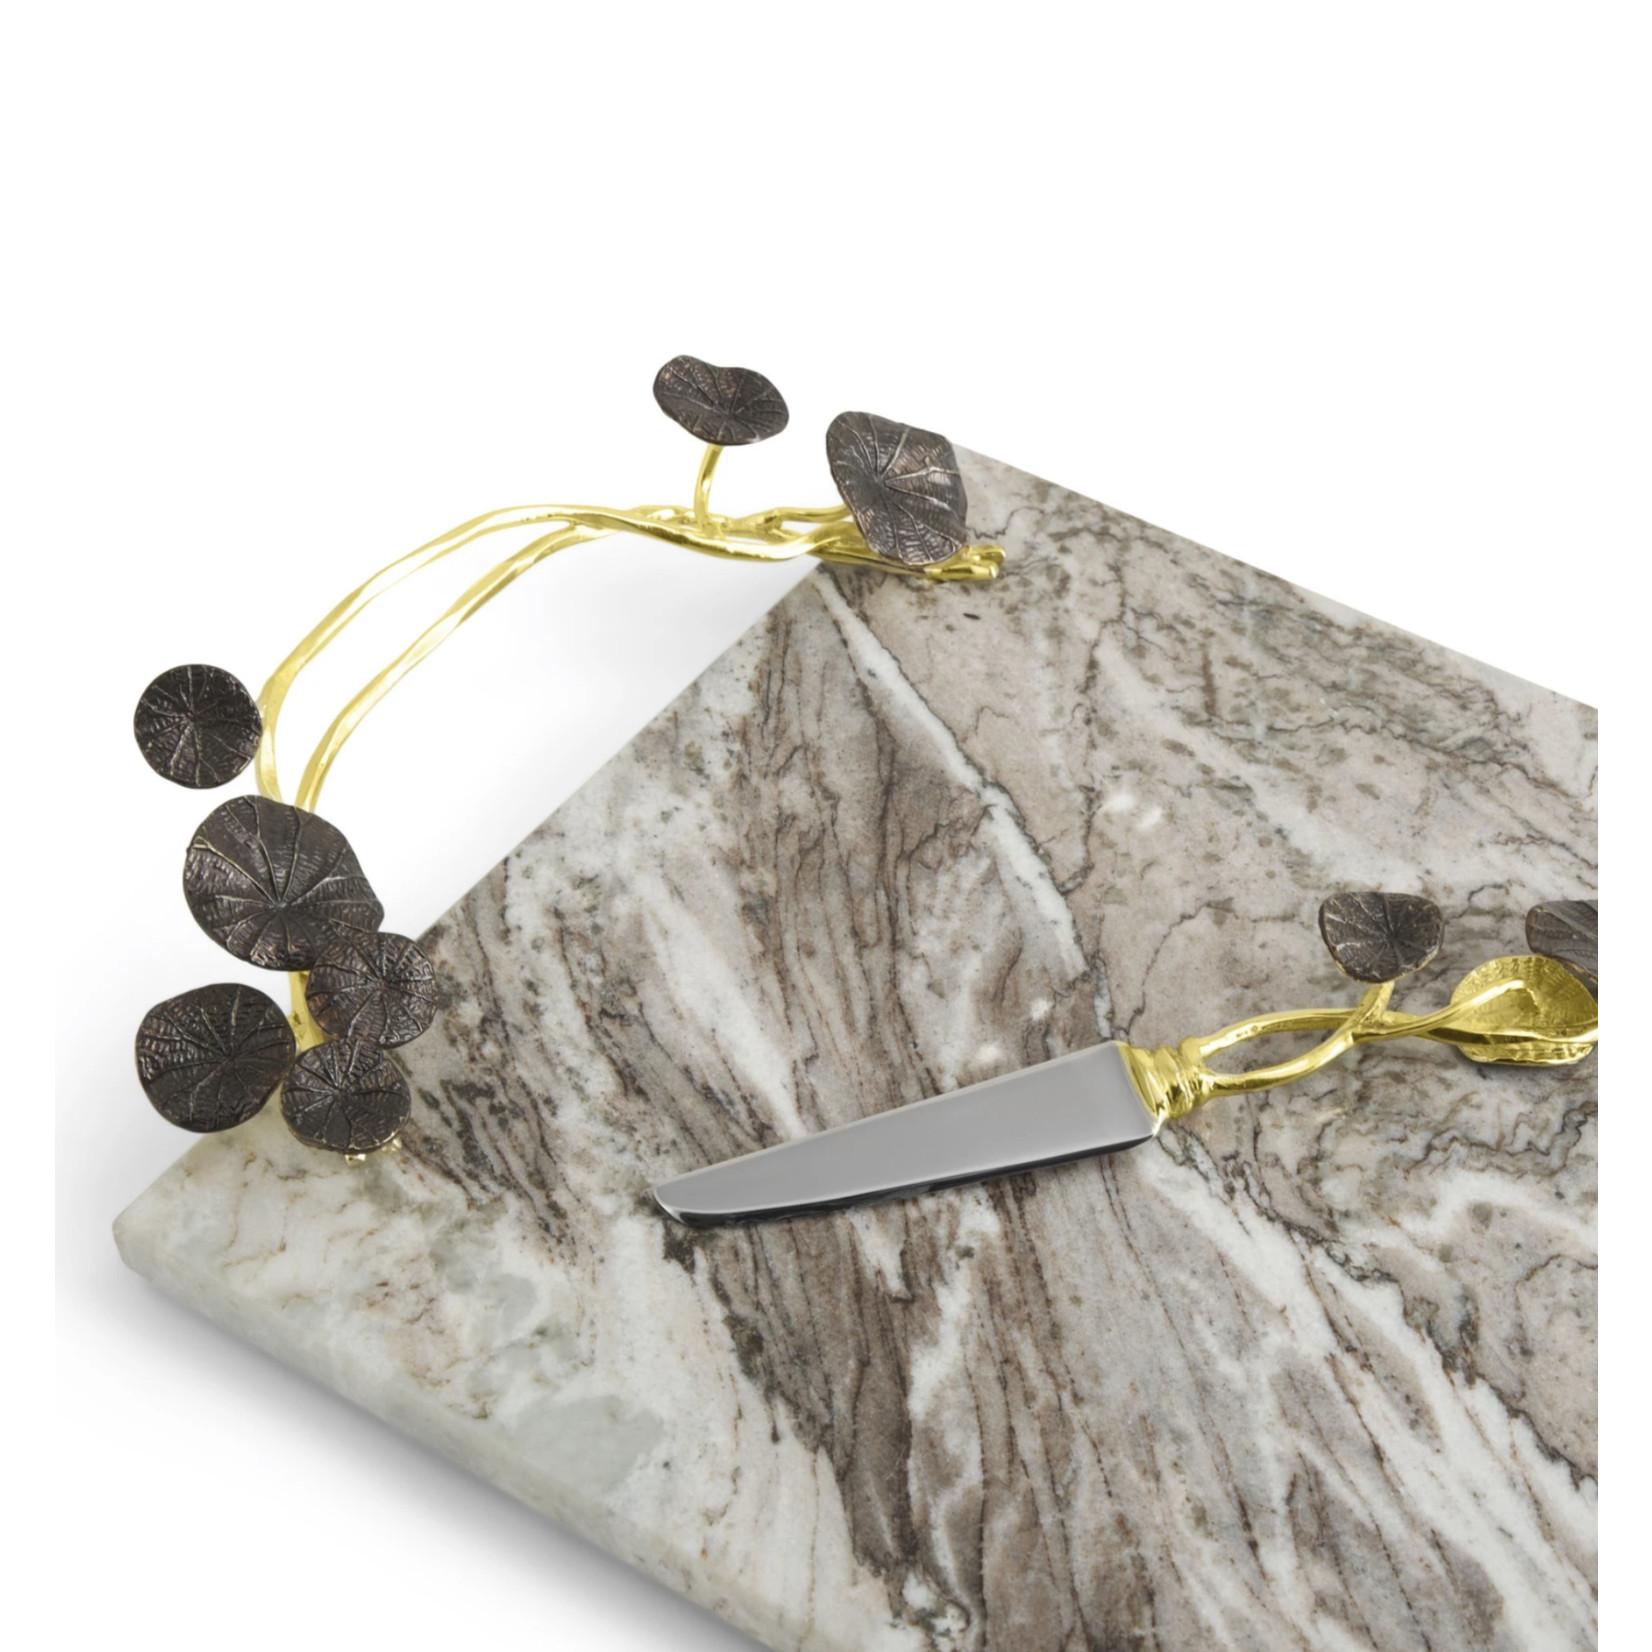 Michael Aram Monet's Garden - Golden Sunset Large Cheese Board with Knife